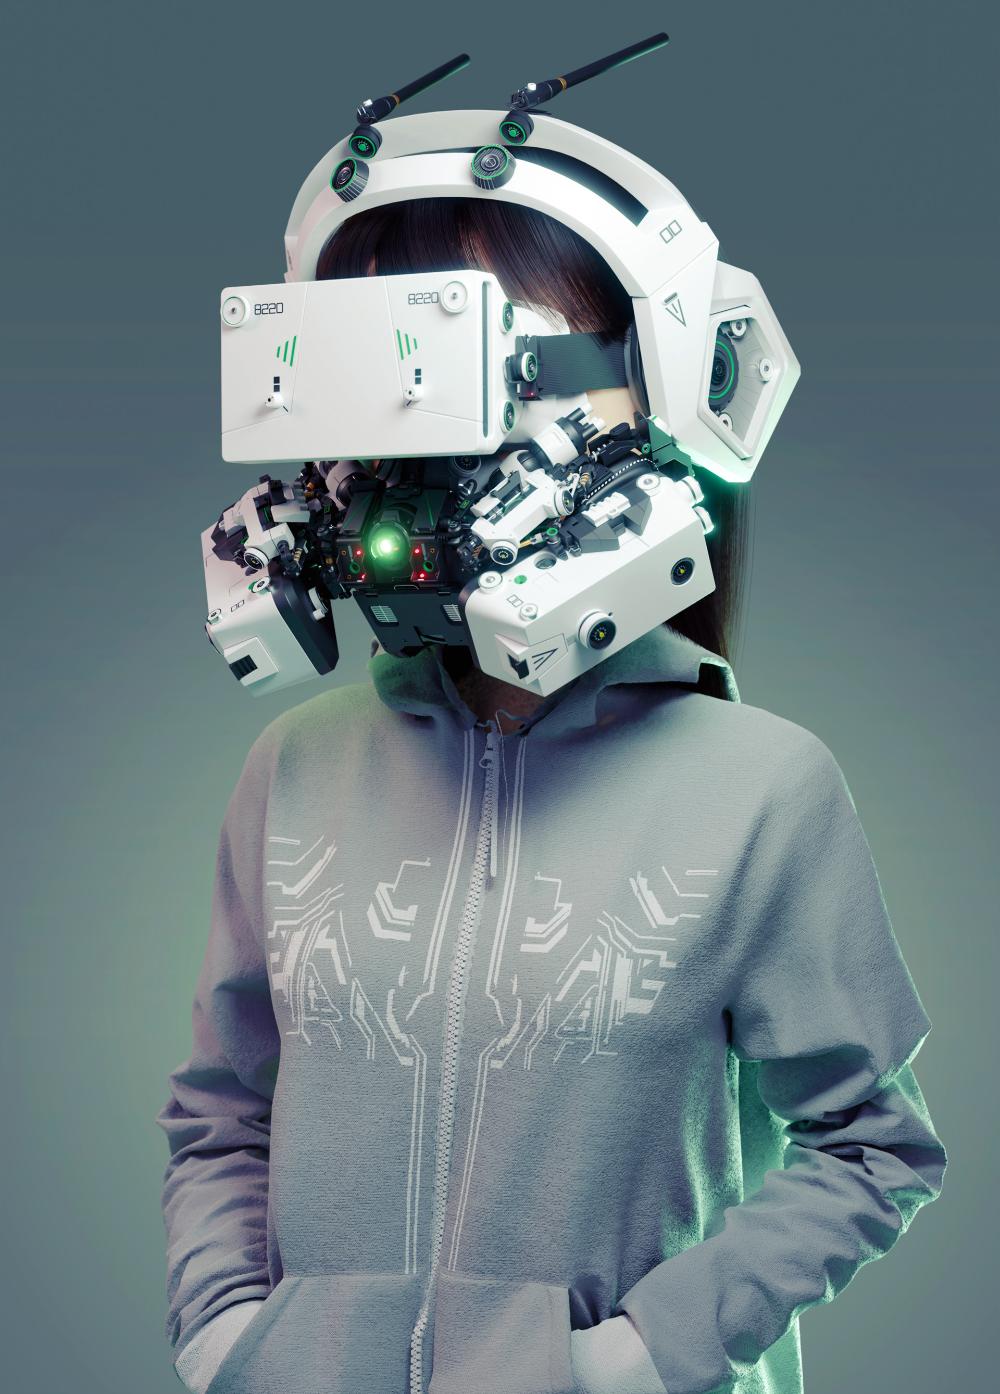 ArtStation Virtual Reality, Pablo Dobarro in 2020